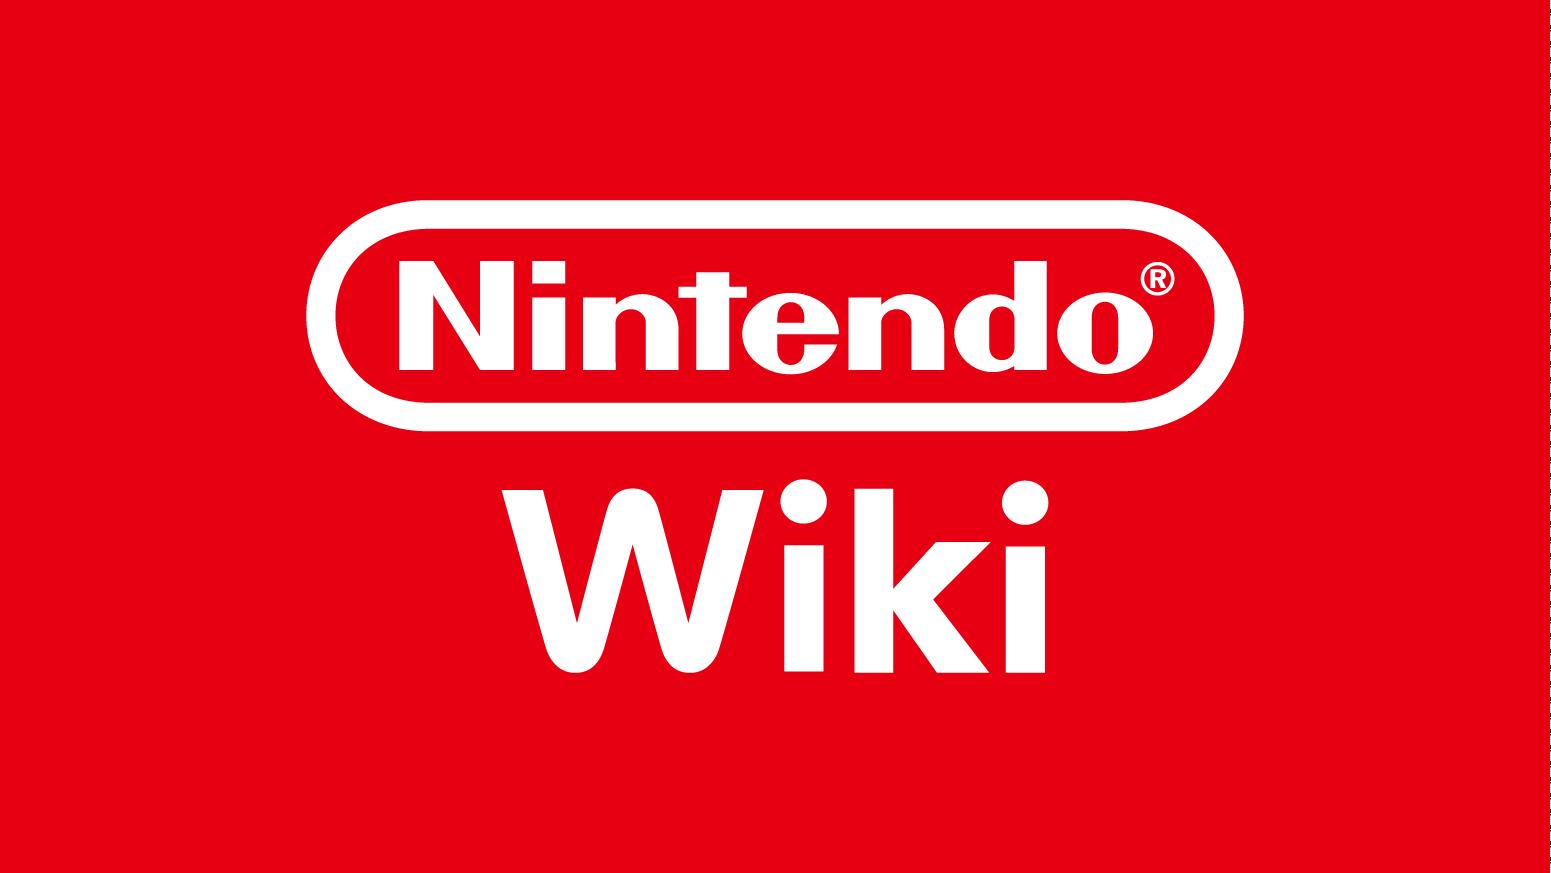 Wikia-Visualization-Main,ennintendo.png